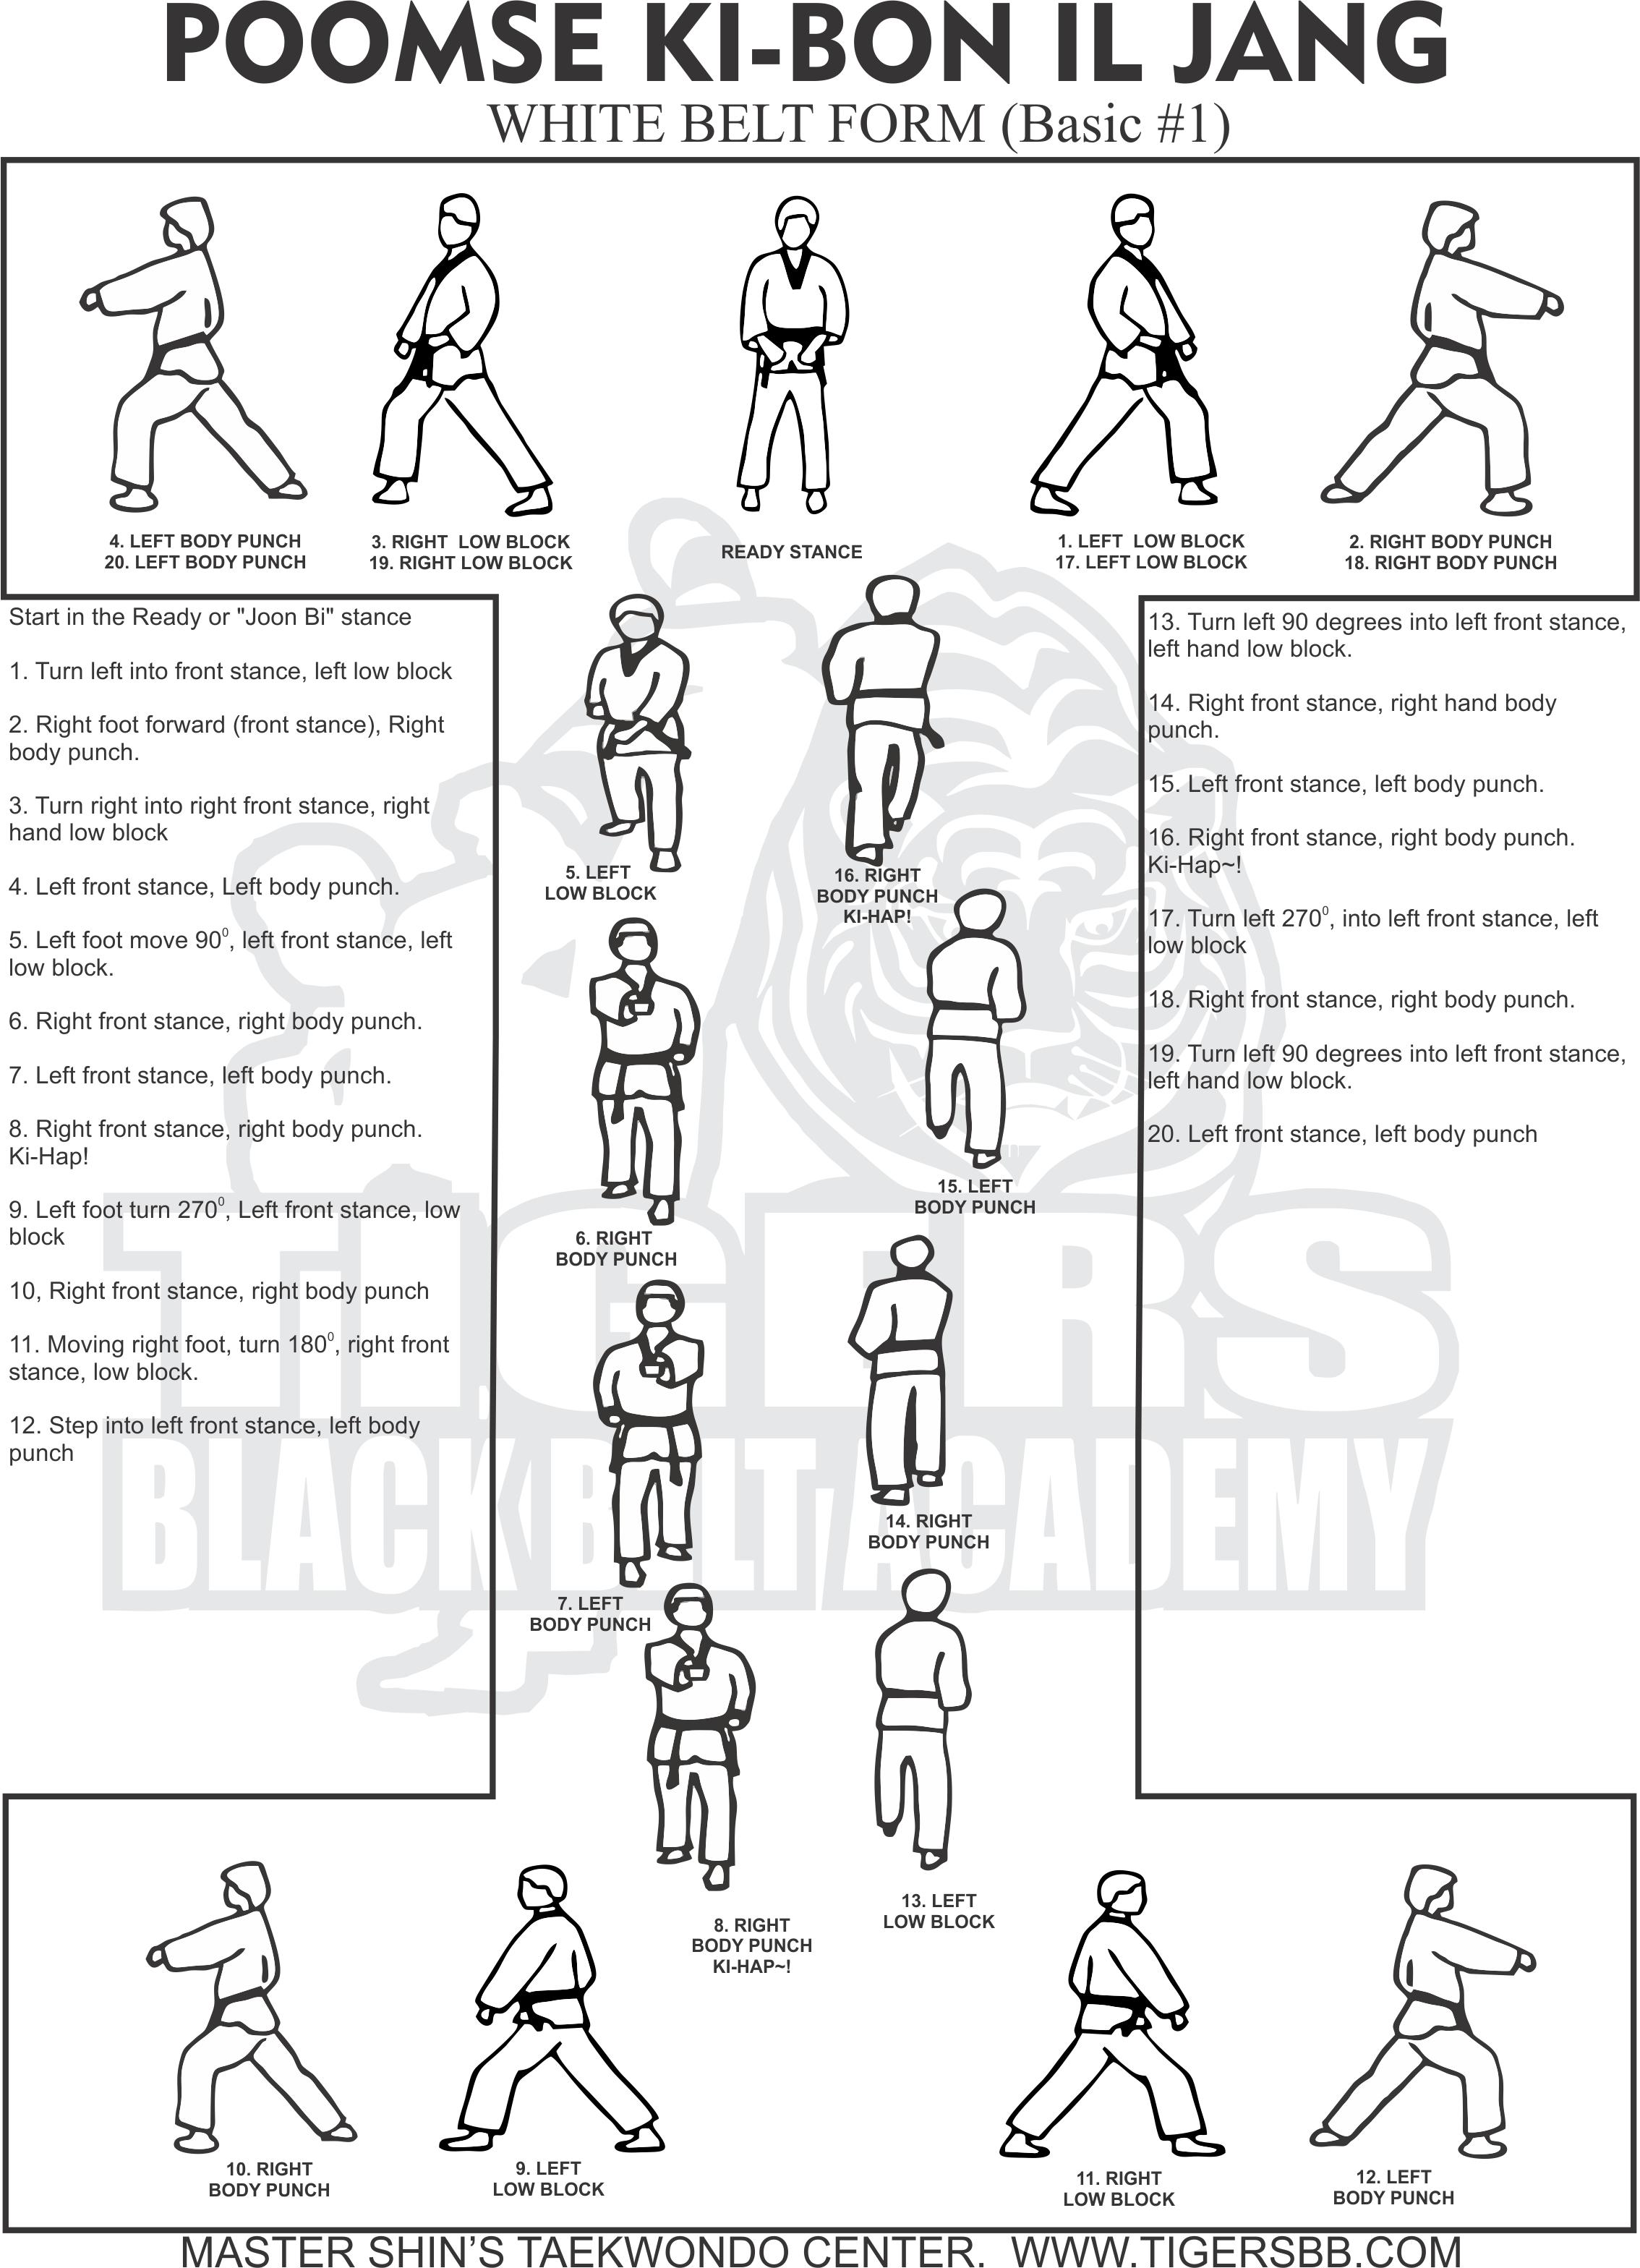 taekwondo white belt form step by step 30 000 belt tensioner